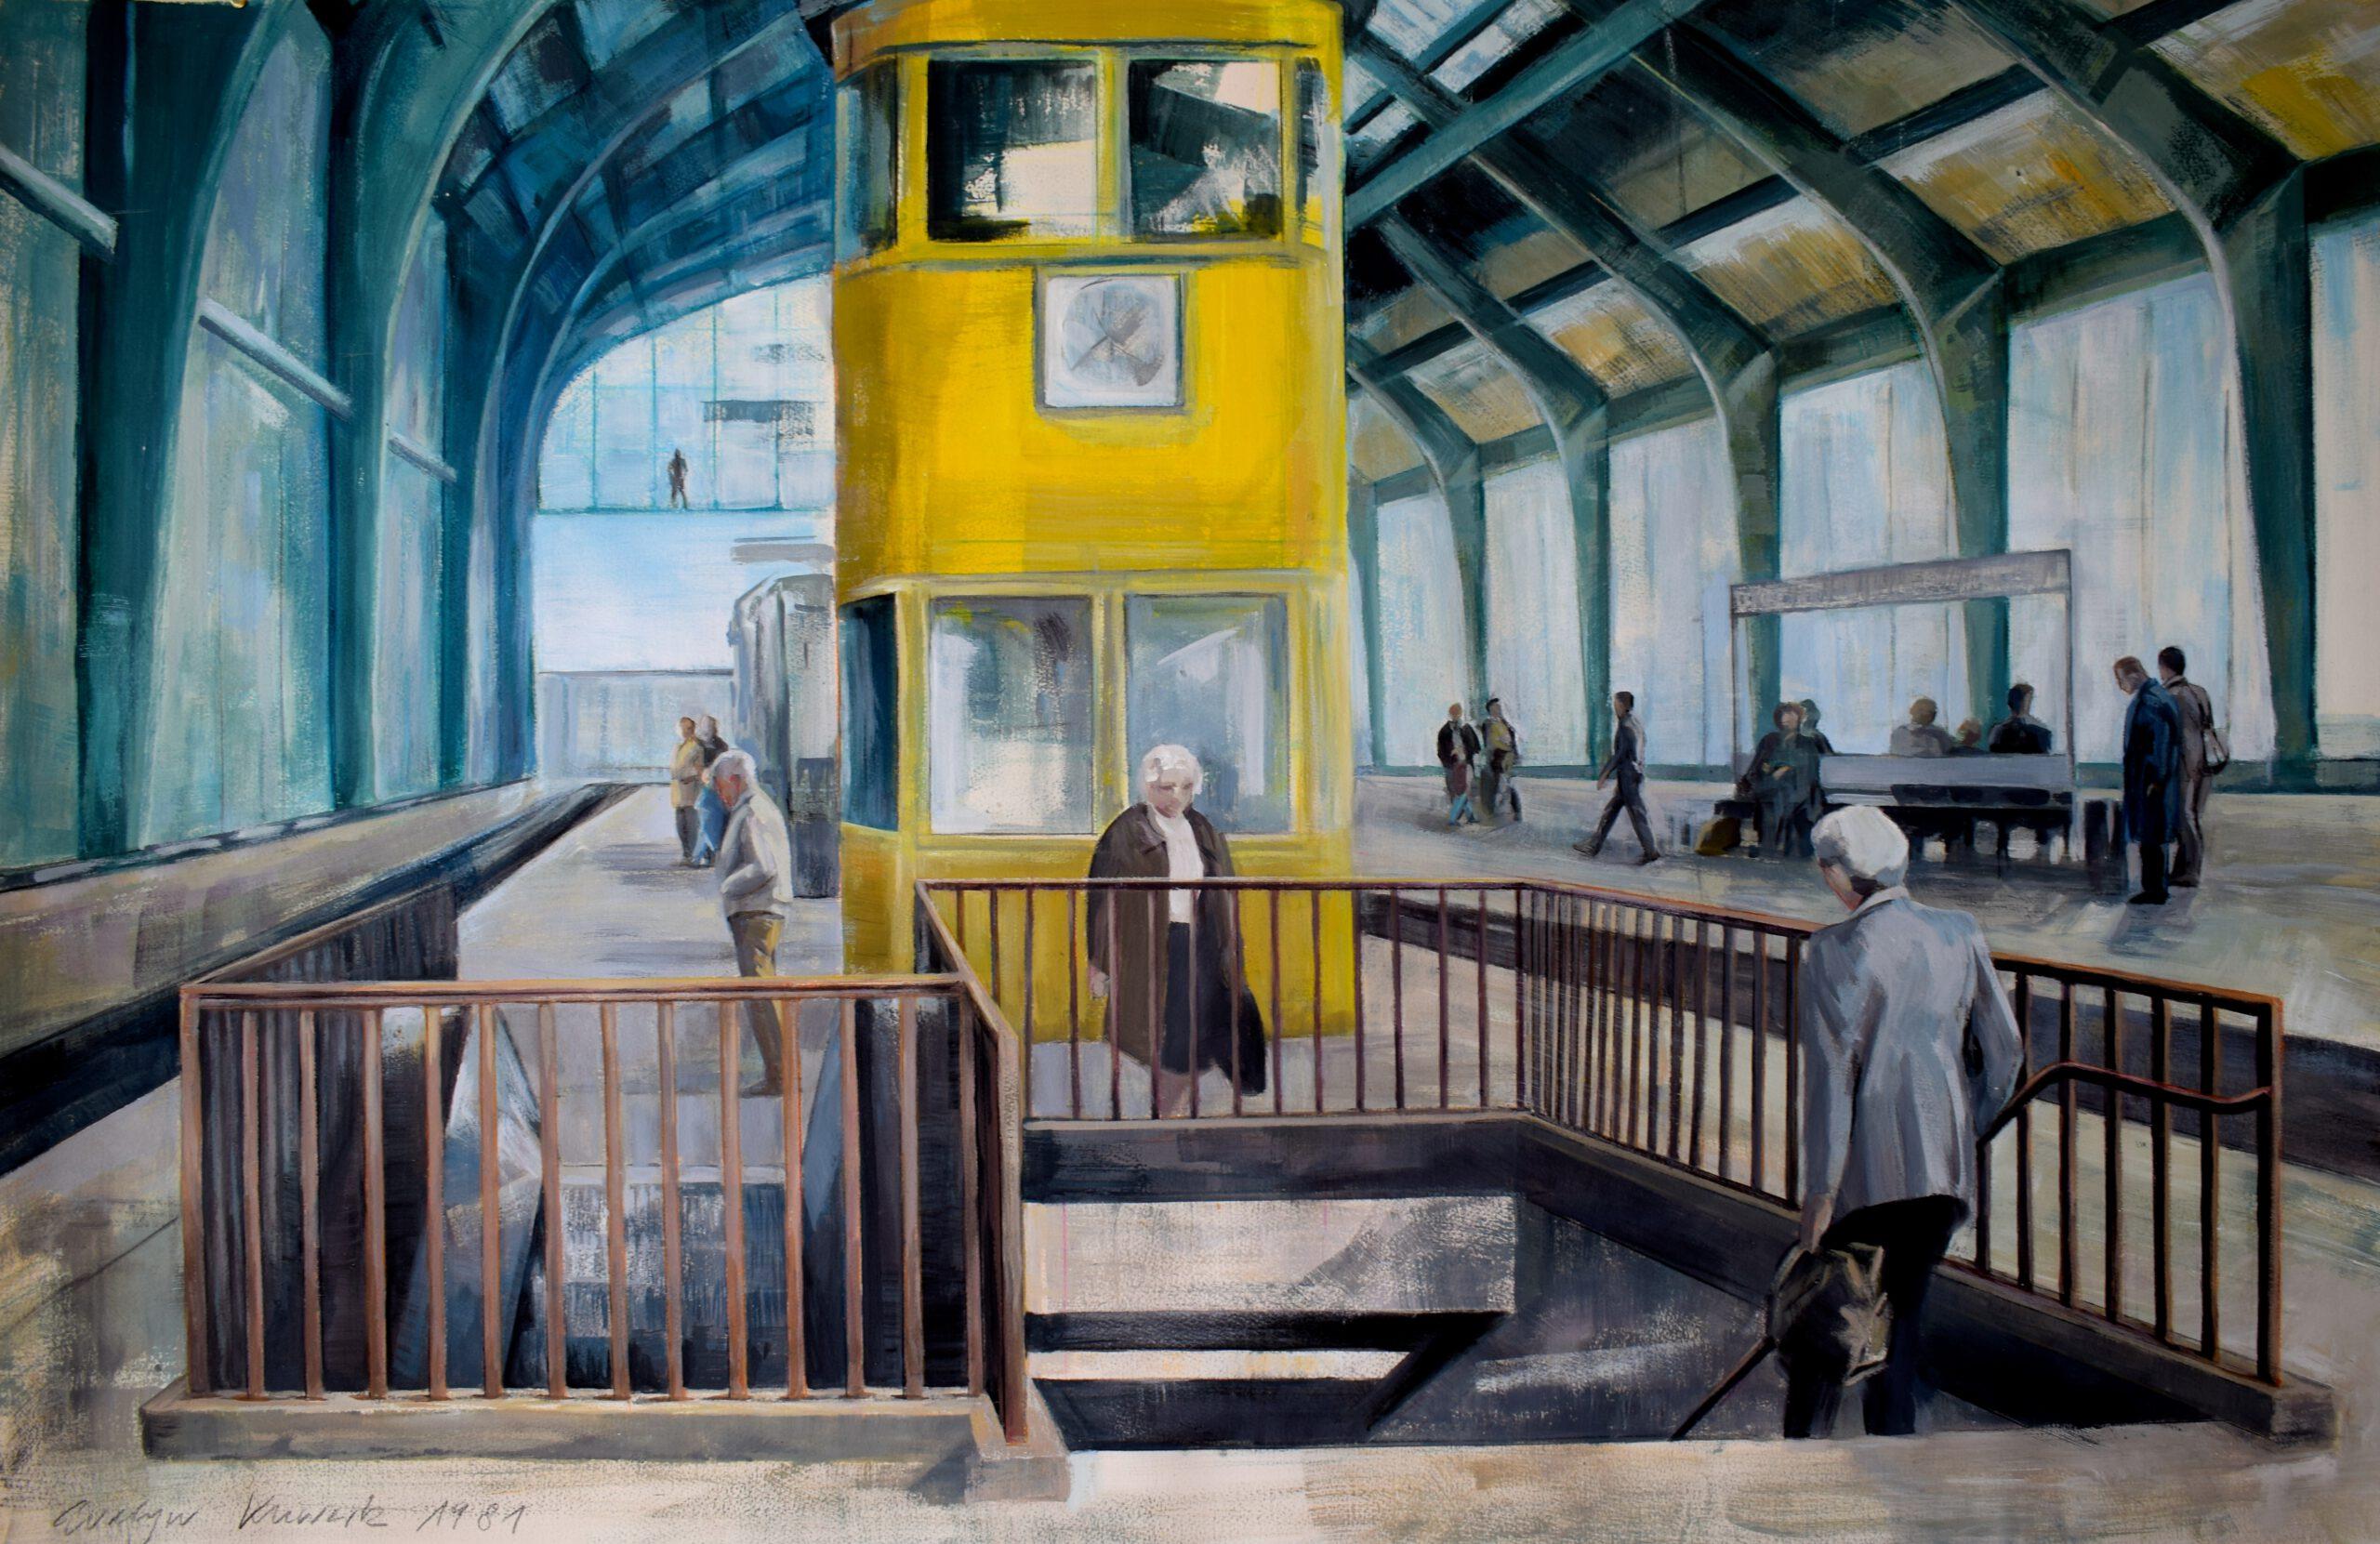 Bahnhof Friedrichstrasse 1980 | 80 / 120cm, Acryl / Papier Bütten